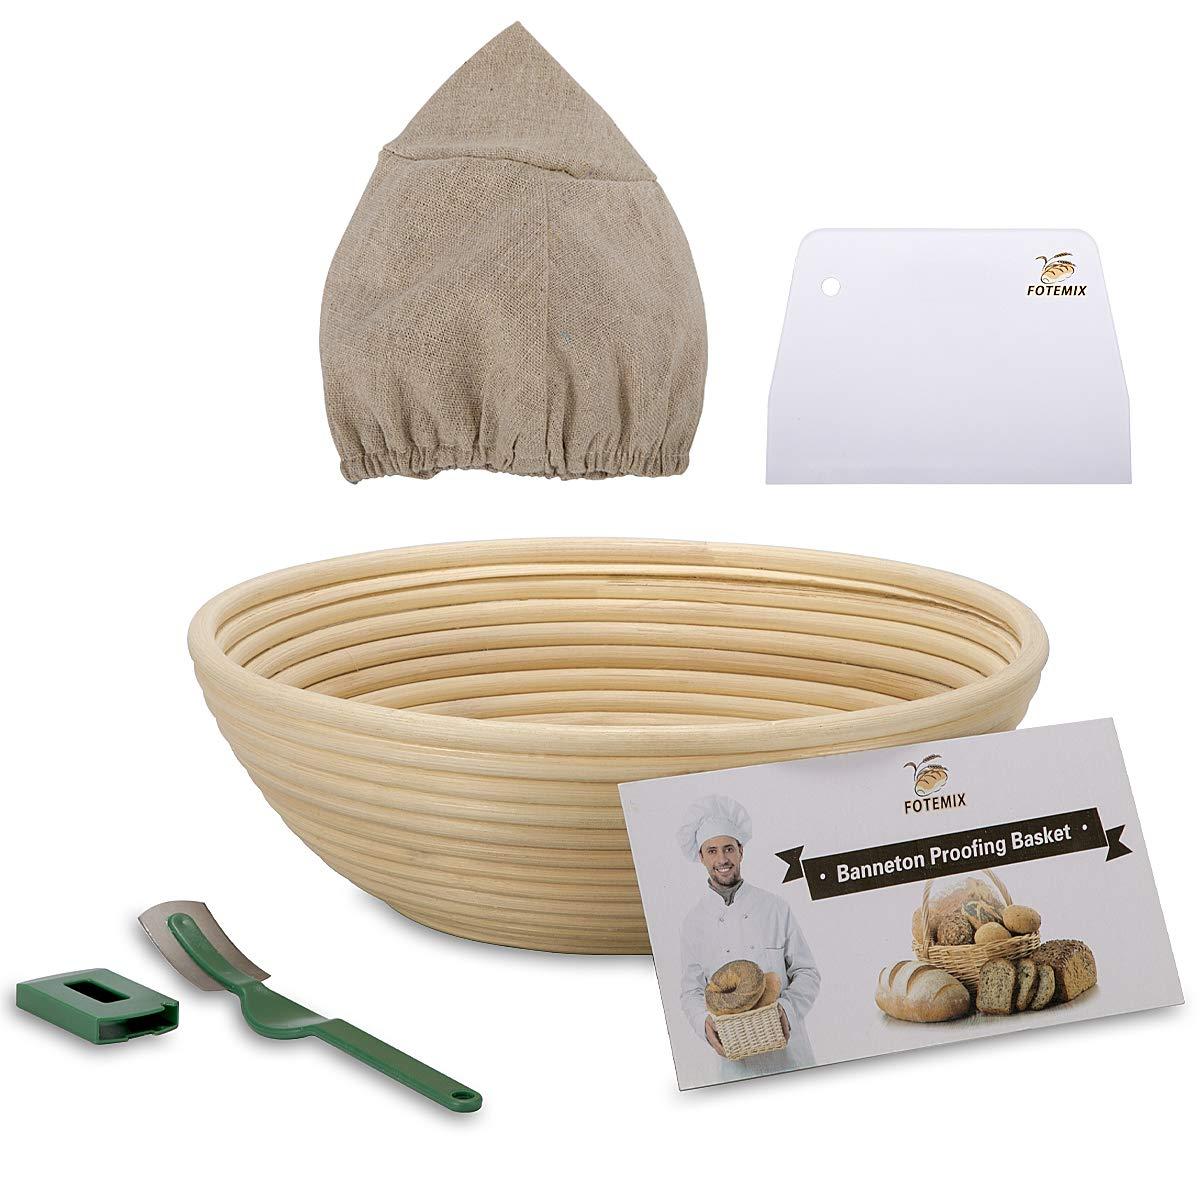 10 Inch Bread Proofing Basket - Banneton Proofing Basket + Cloth Liner + Dough Scraper + Bread Lame + Starter Recipe Set - Sourdough Basket Set For Professional and Home Bakers Artisan Bread Making